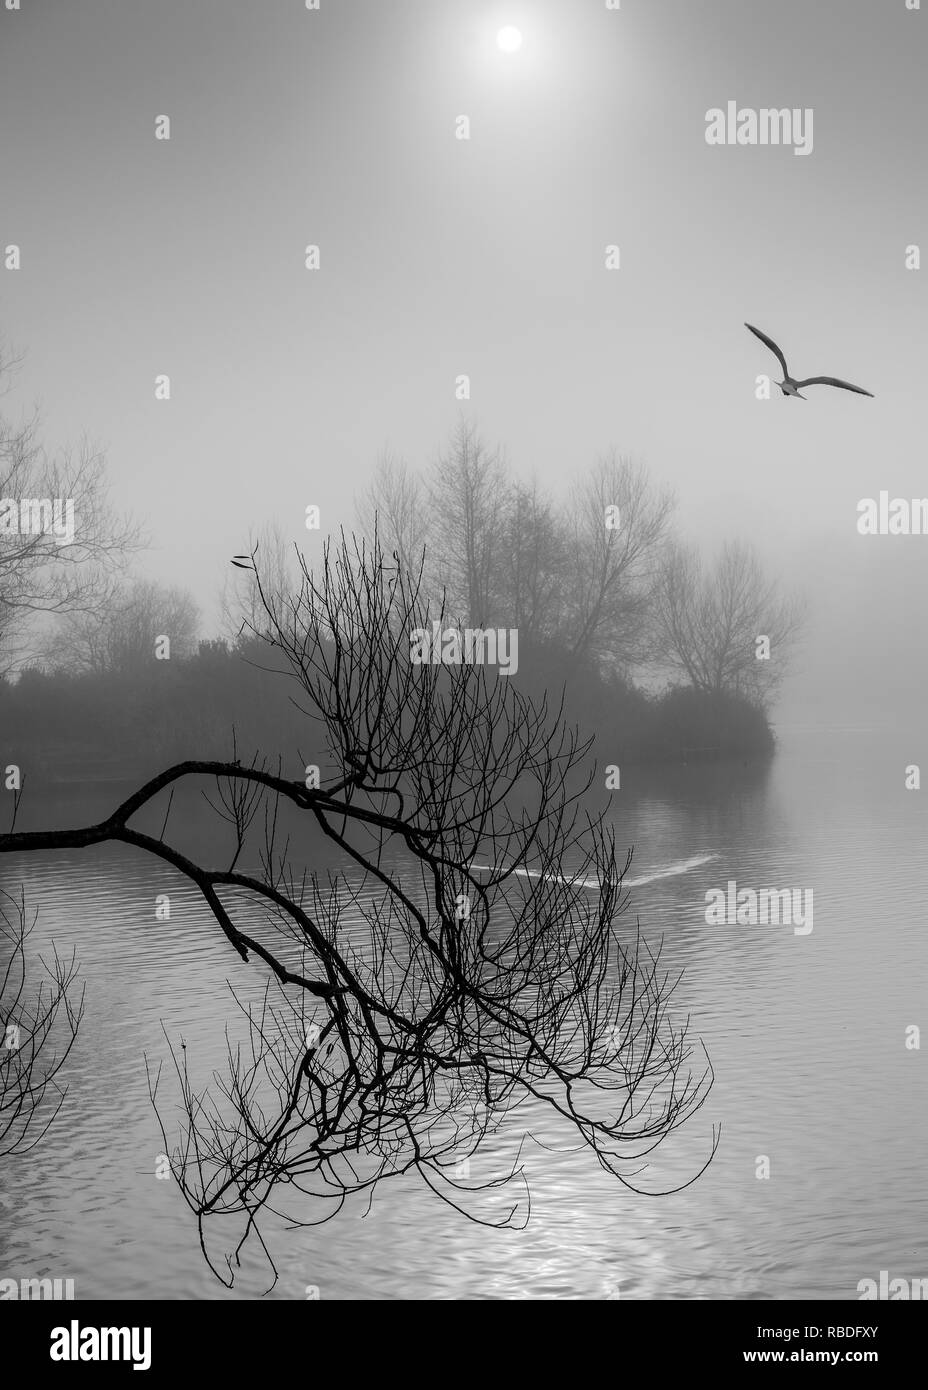 Misty - Stock Image